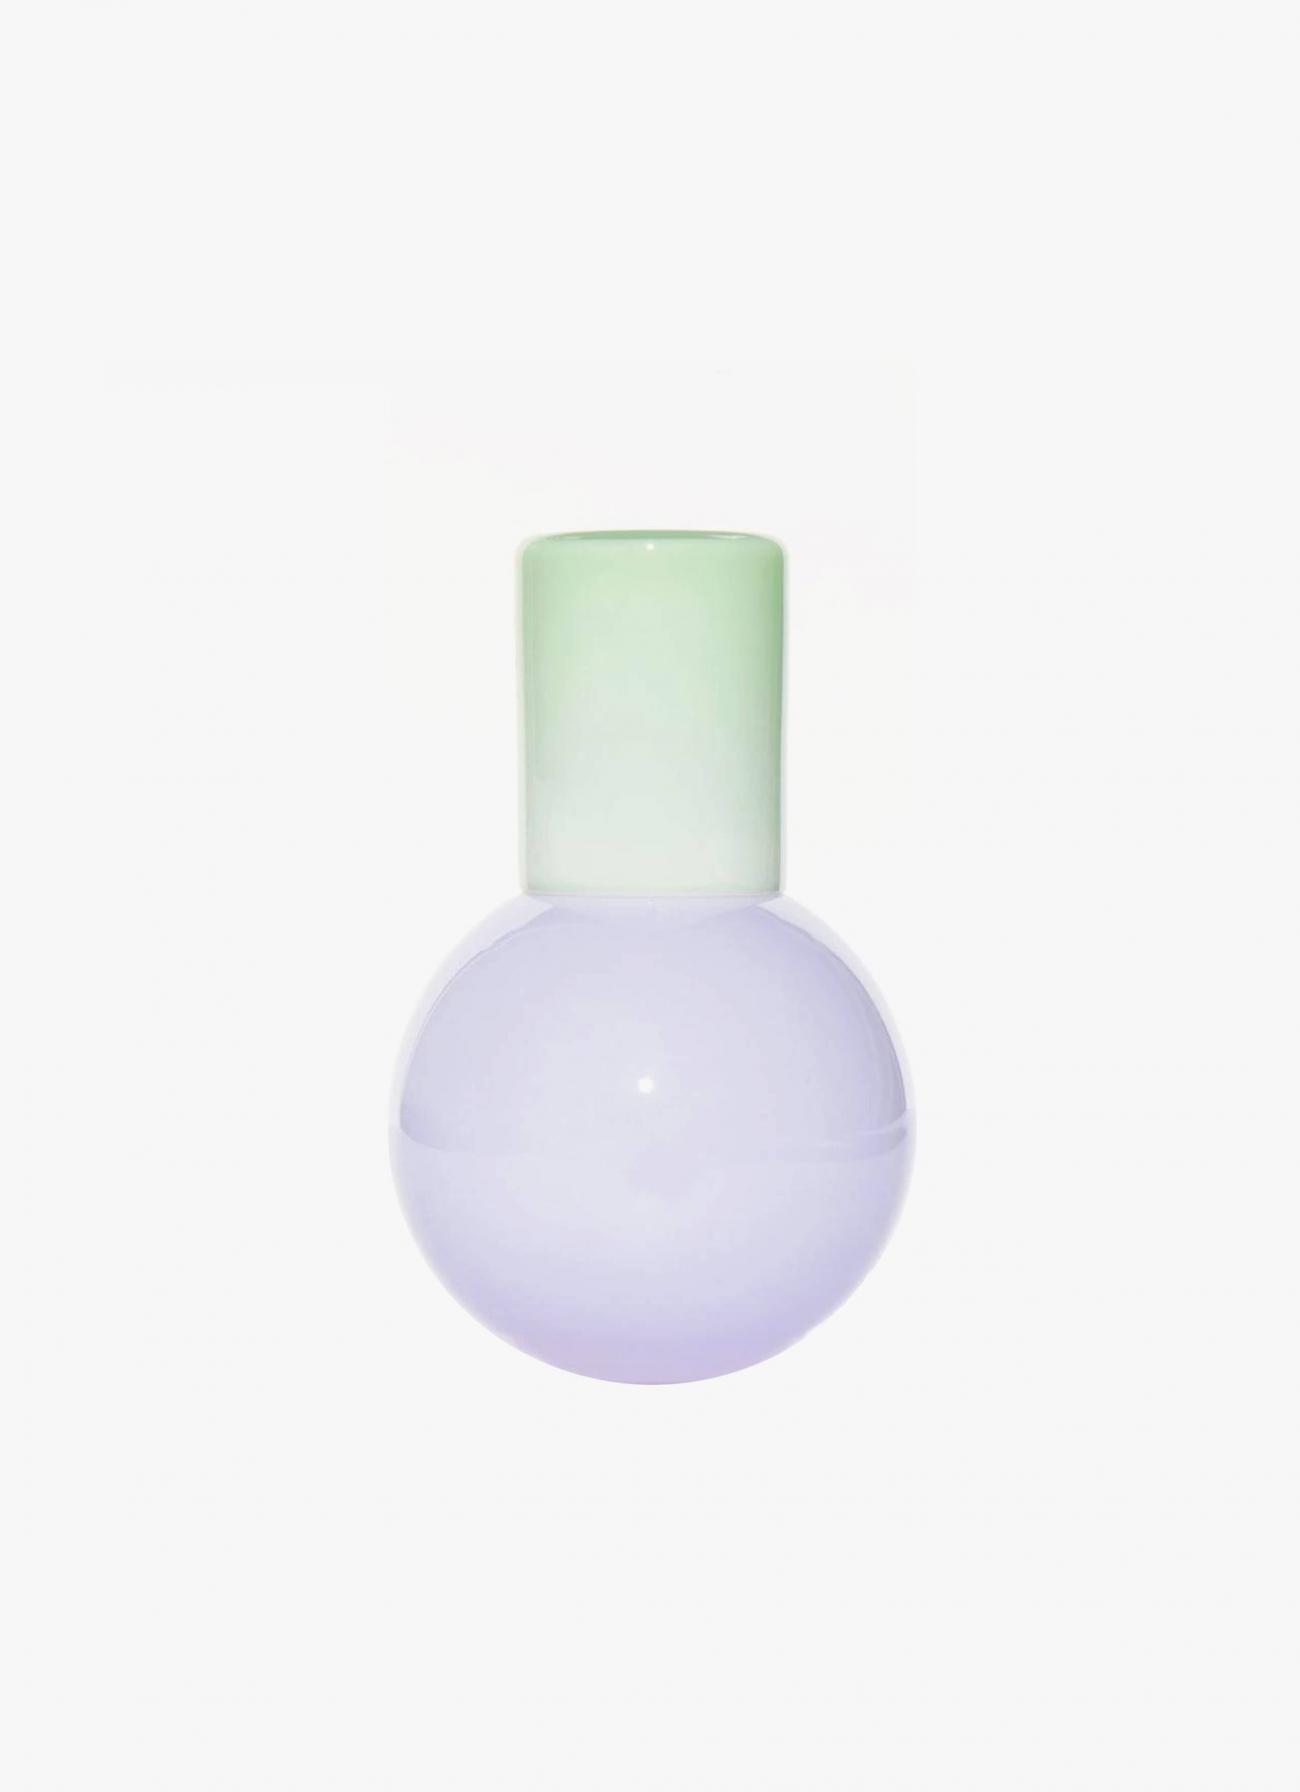 Anna Karlin - Bedside Carafe - Purple and Mint